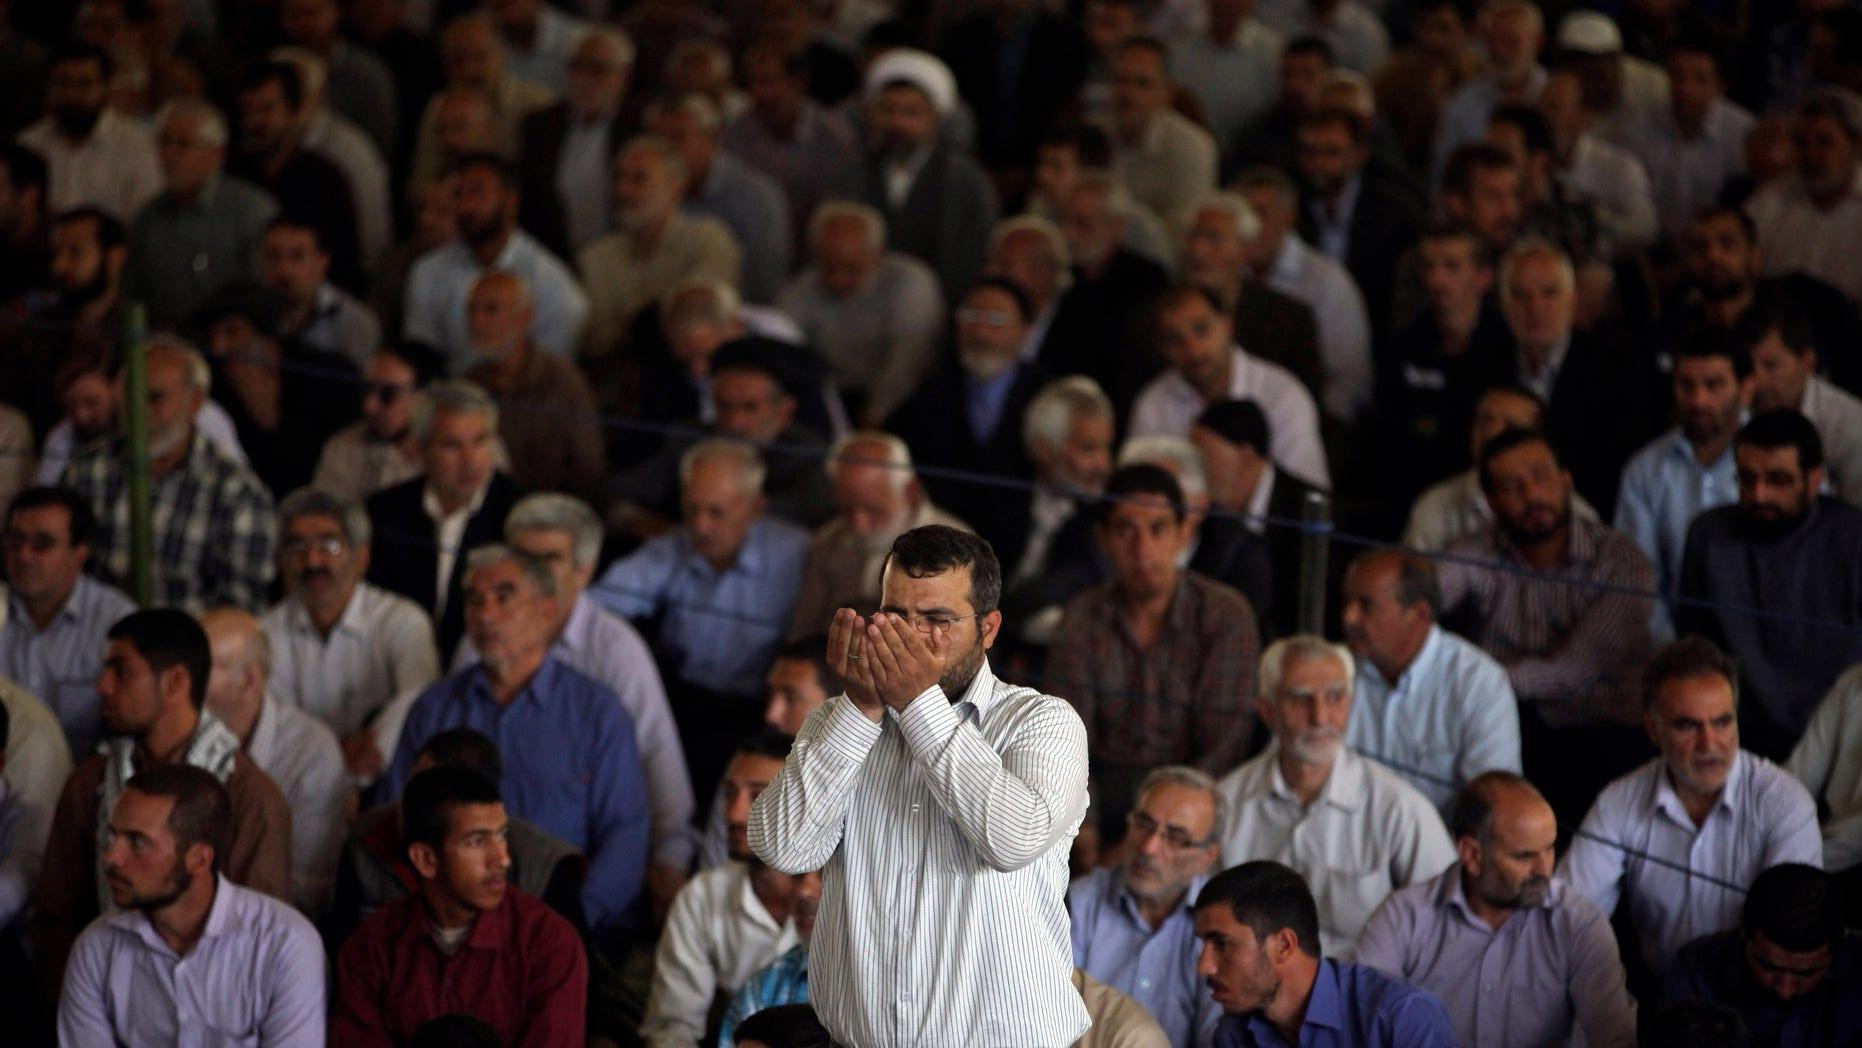 An Iranian worshipper prays at the start of Friday prayers at Tehran University in Tehran, Iran, Friday, May 17, 2013. (AP Photo/Vahid Salemi)